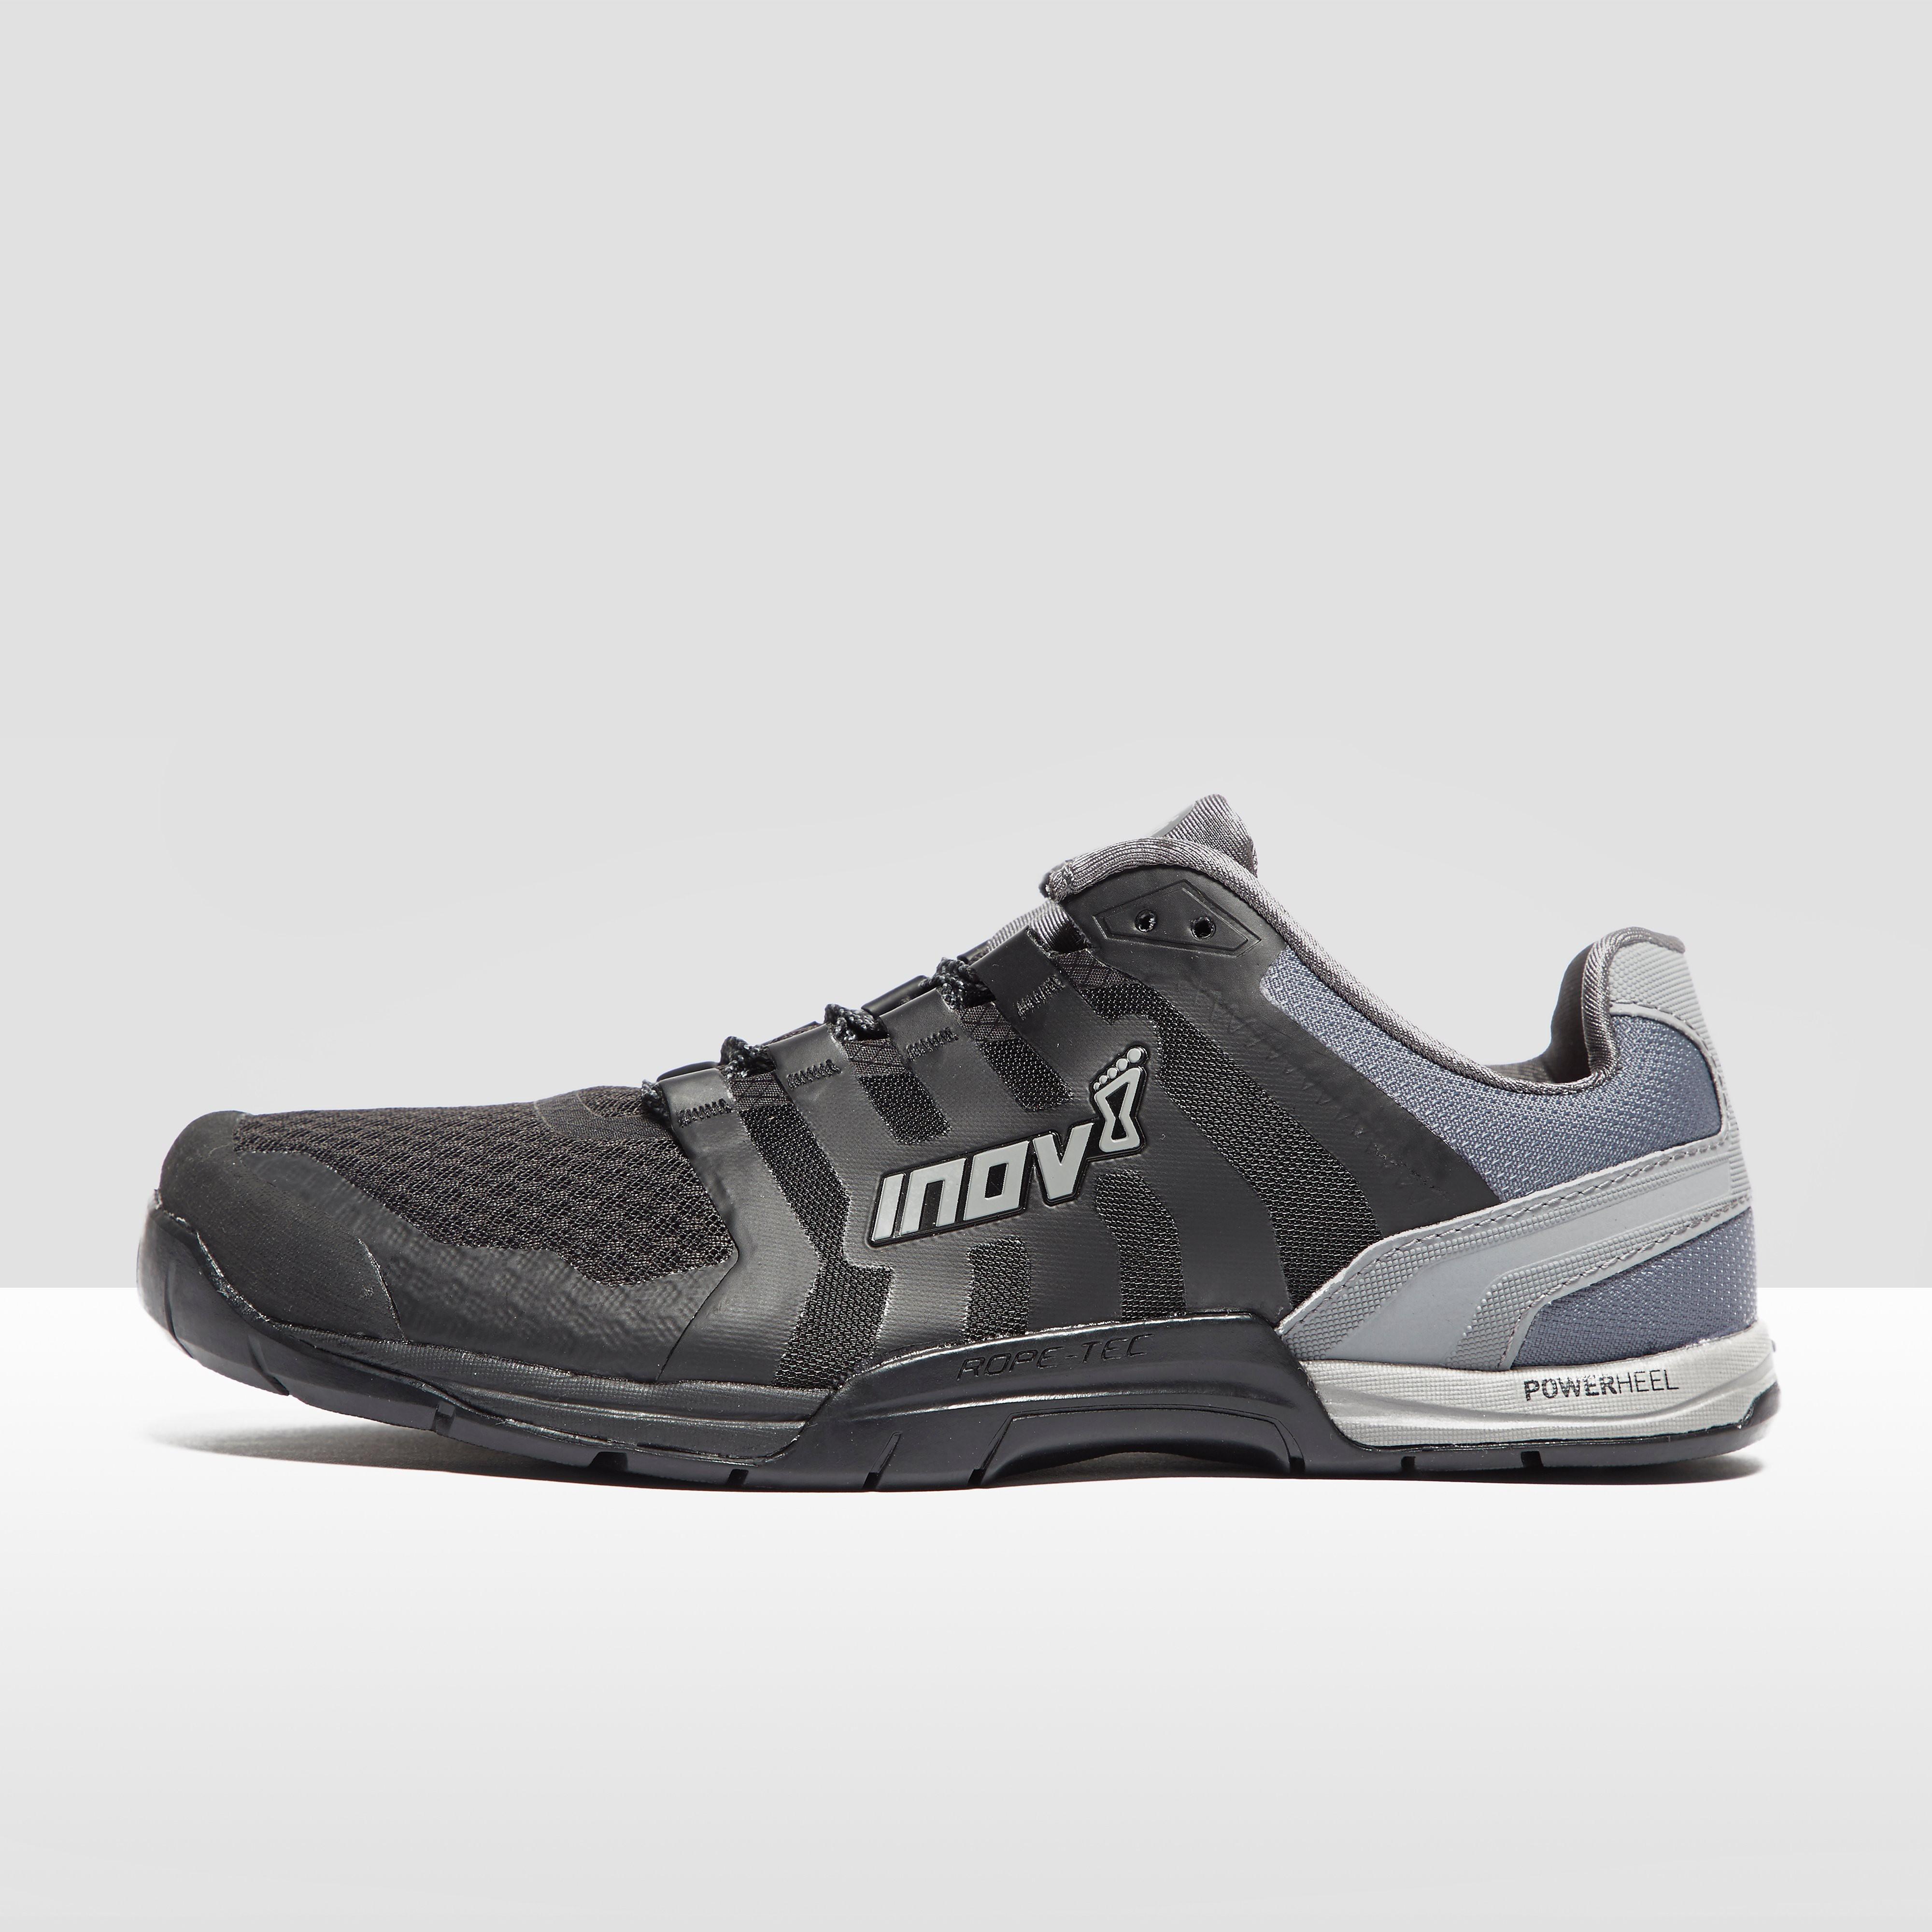 Inov-8 F-LITE 235 V2 Women's Training Shoes